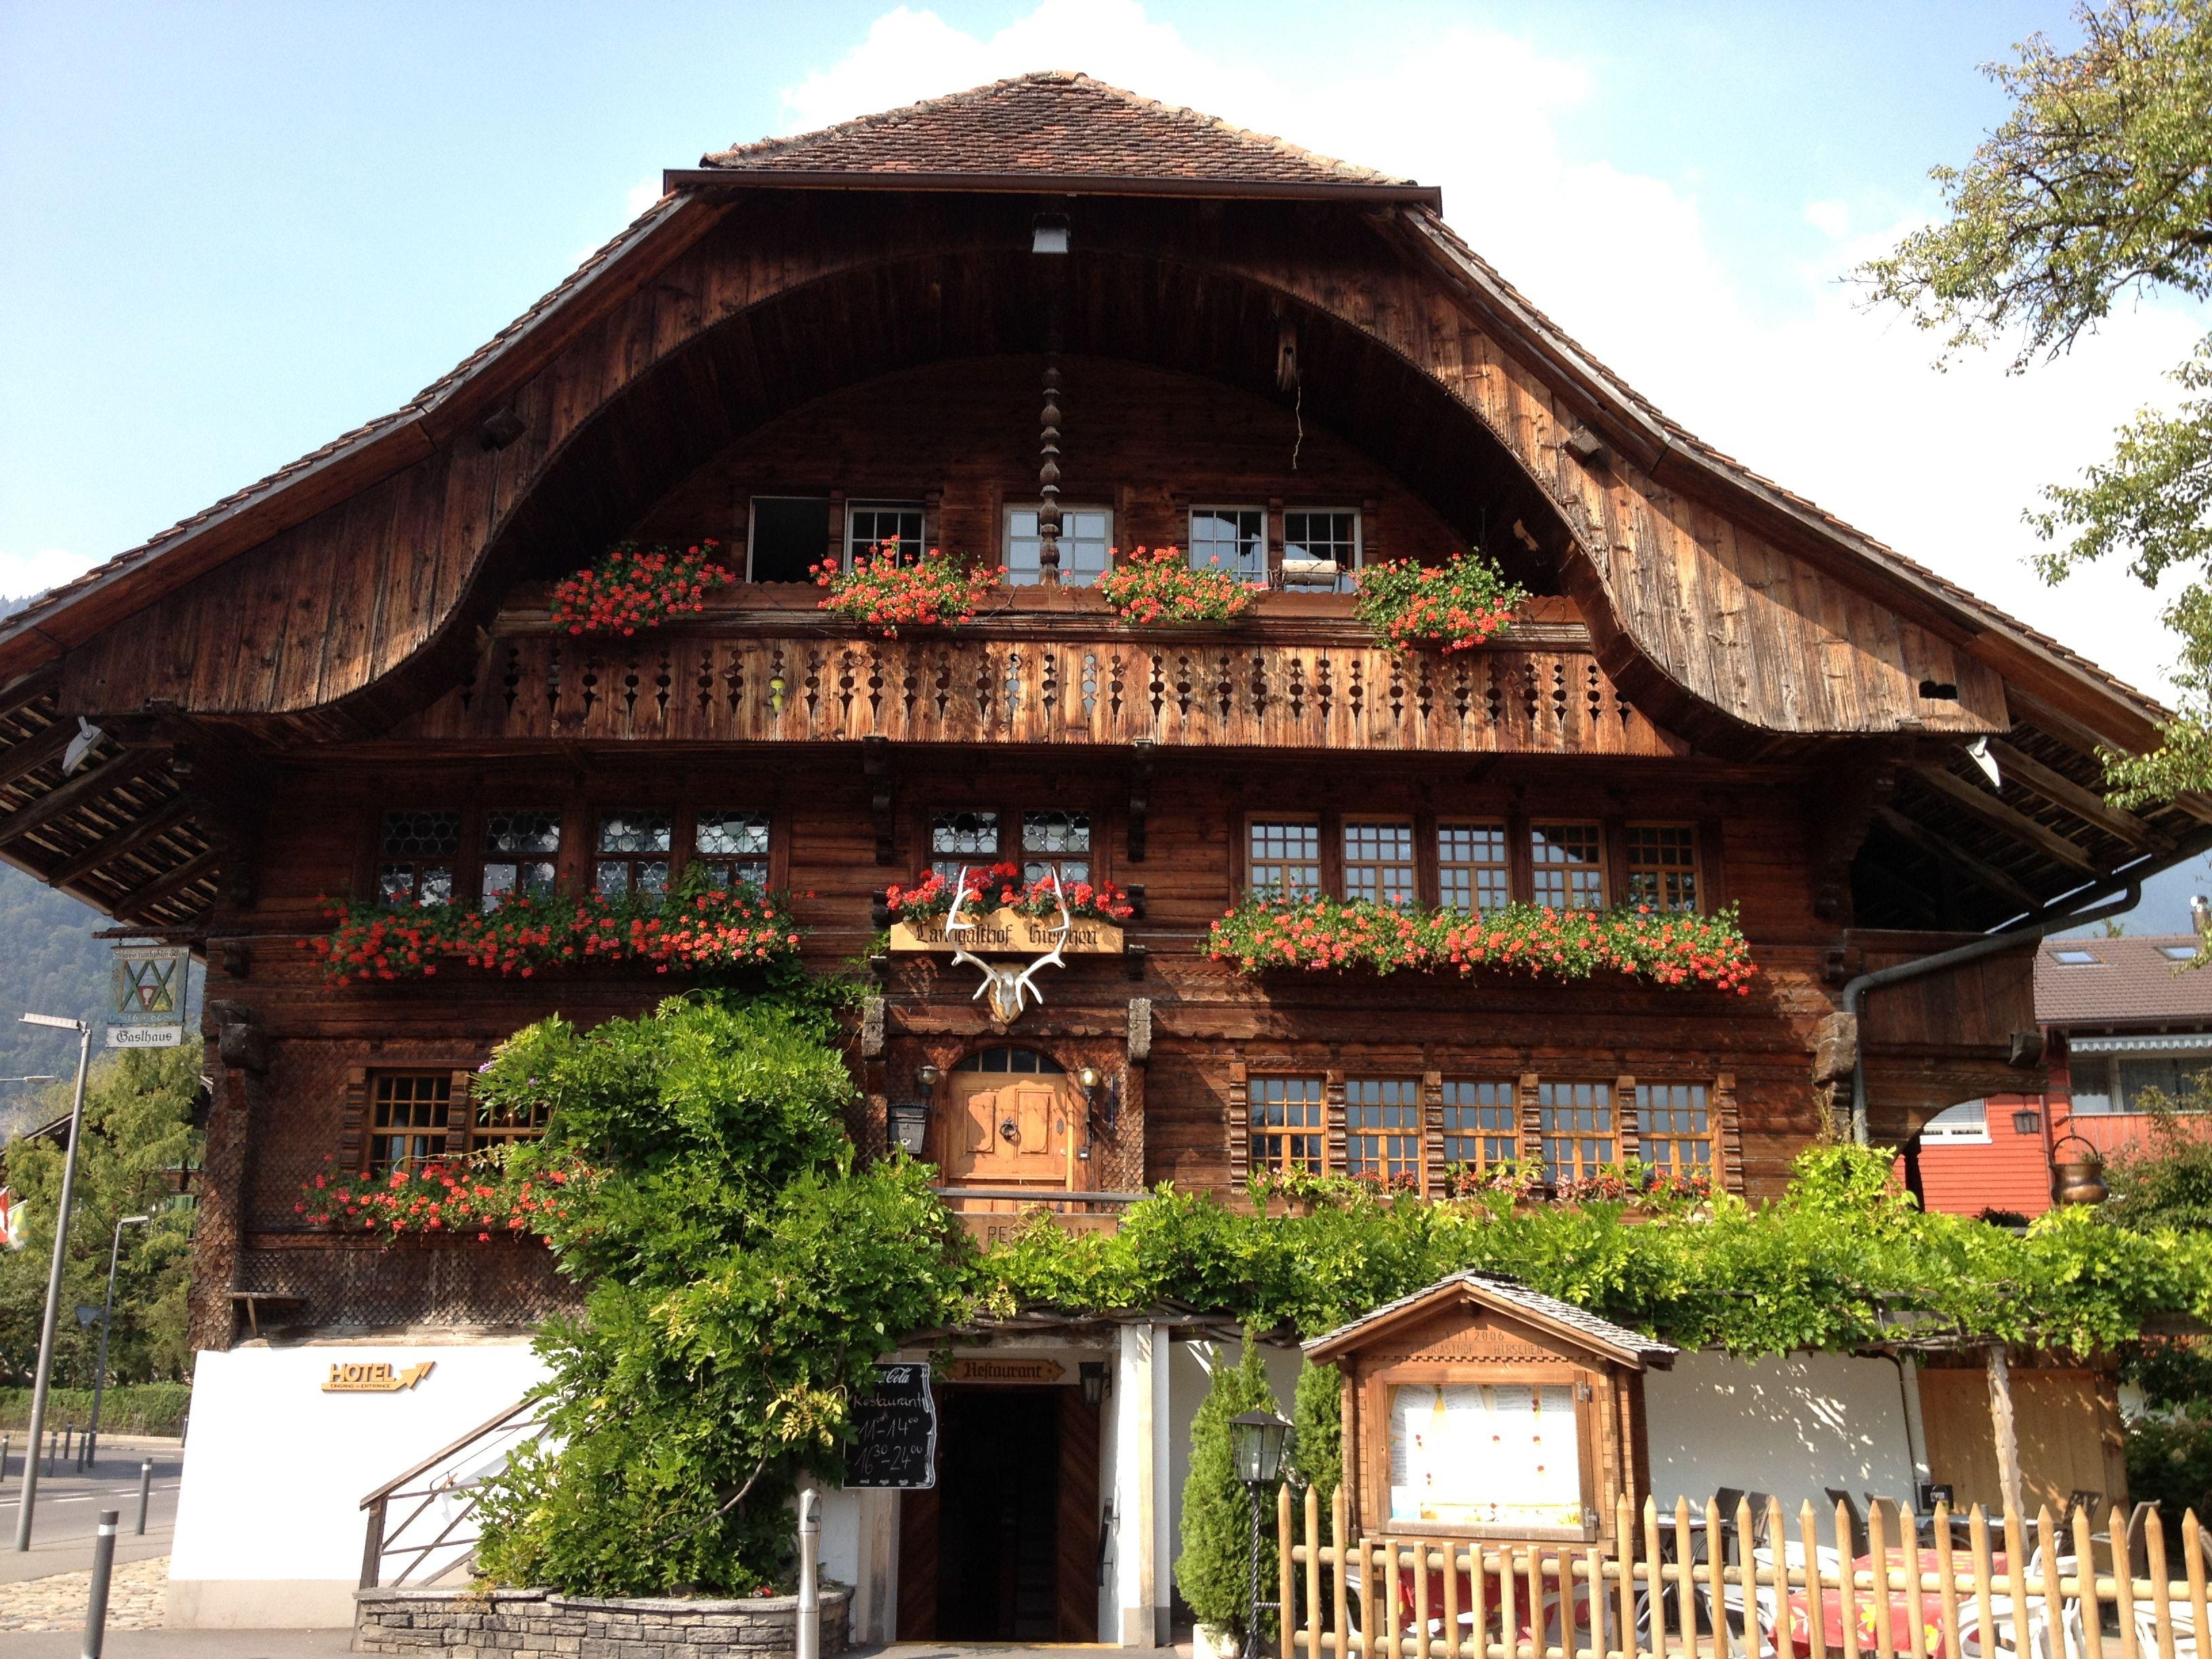 84 best German/Bavarian/Swiss Design images on Pinterest | Doors ...